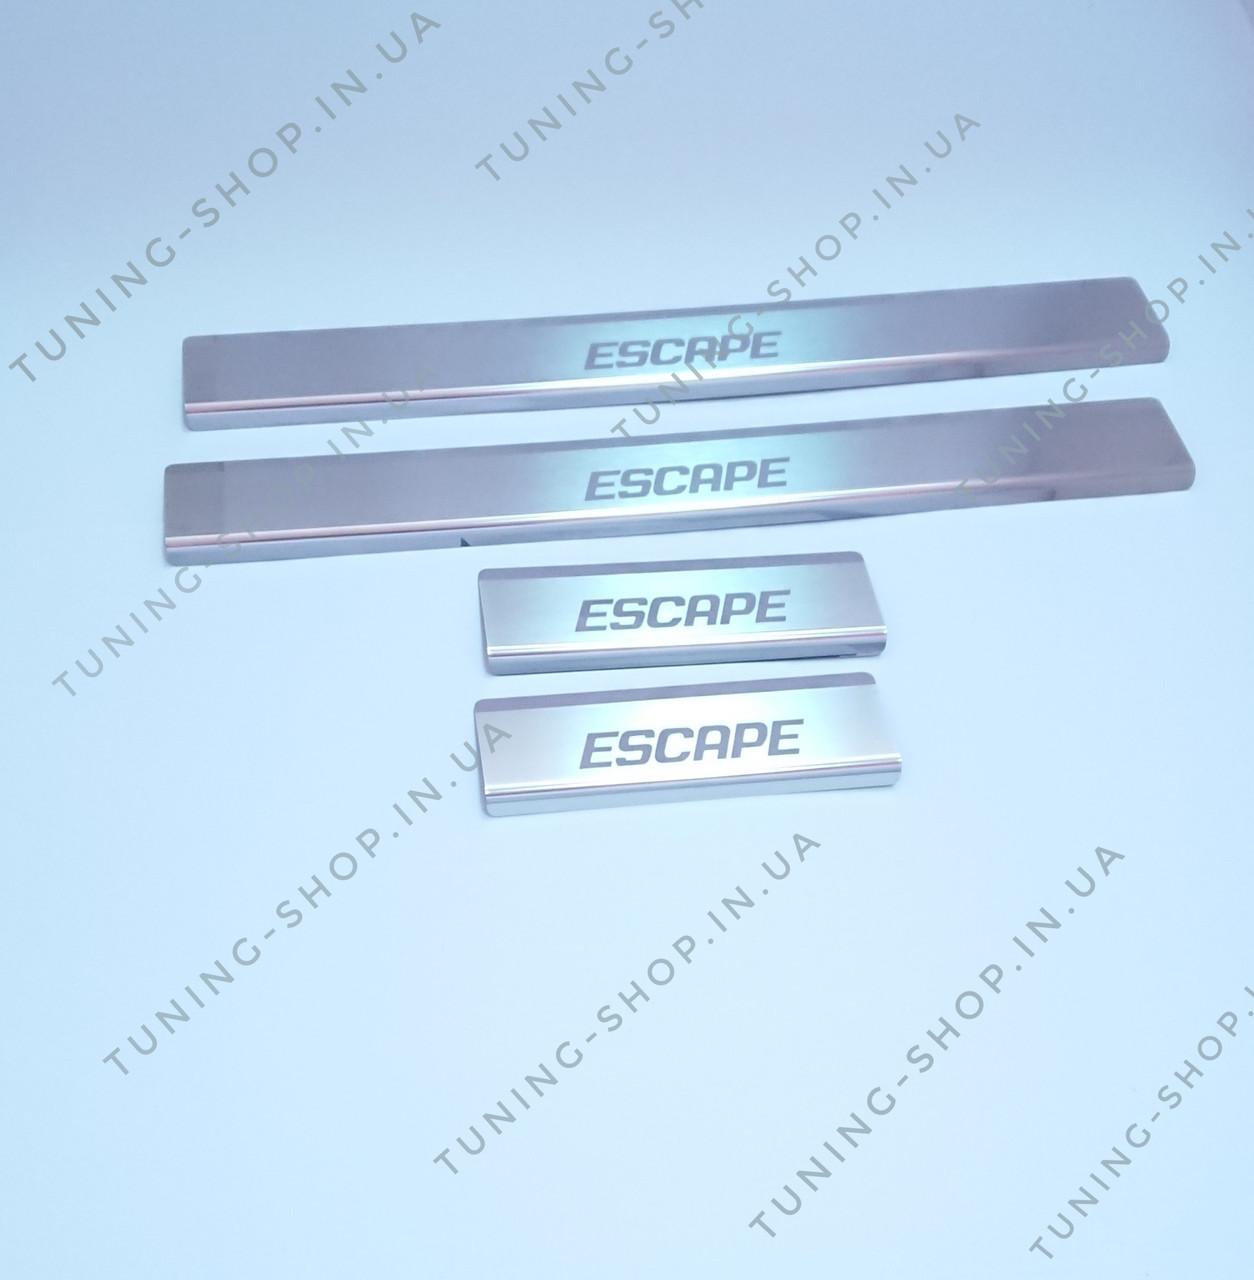 Накладки на пороги Ford Escape 2012-2019, Premium